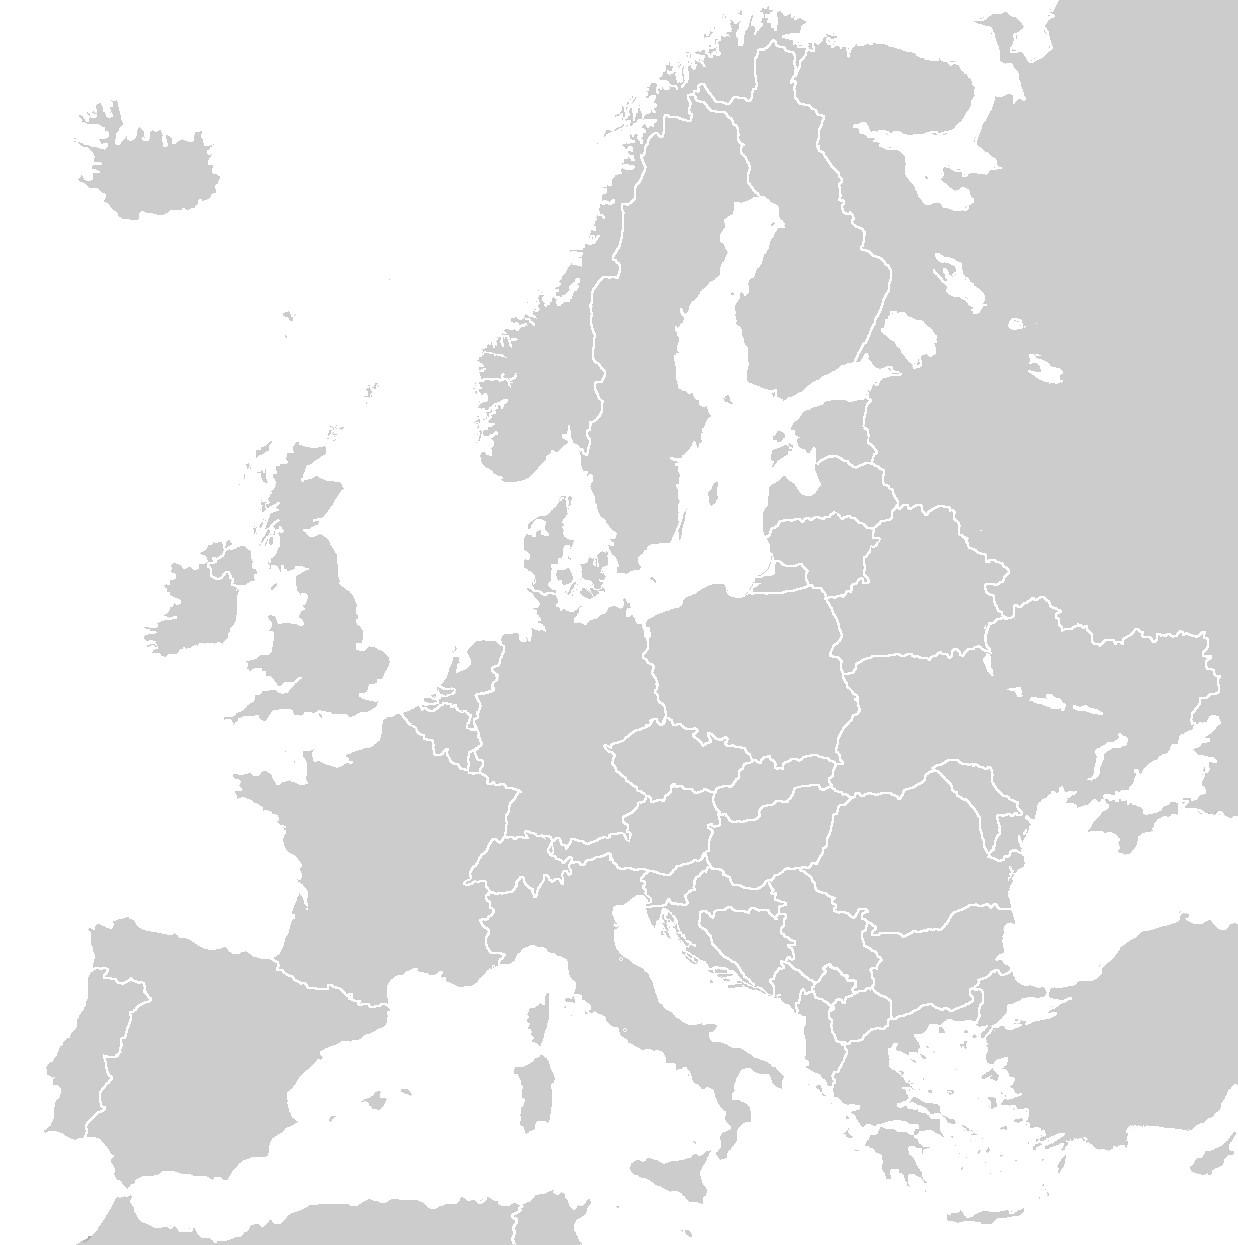 Europe_blank_map